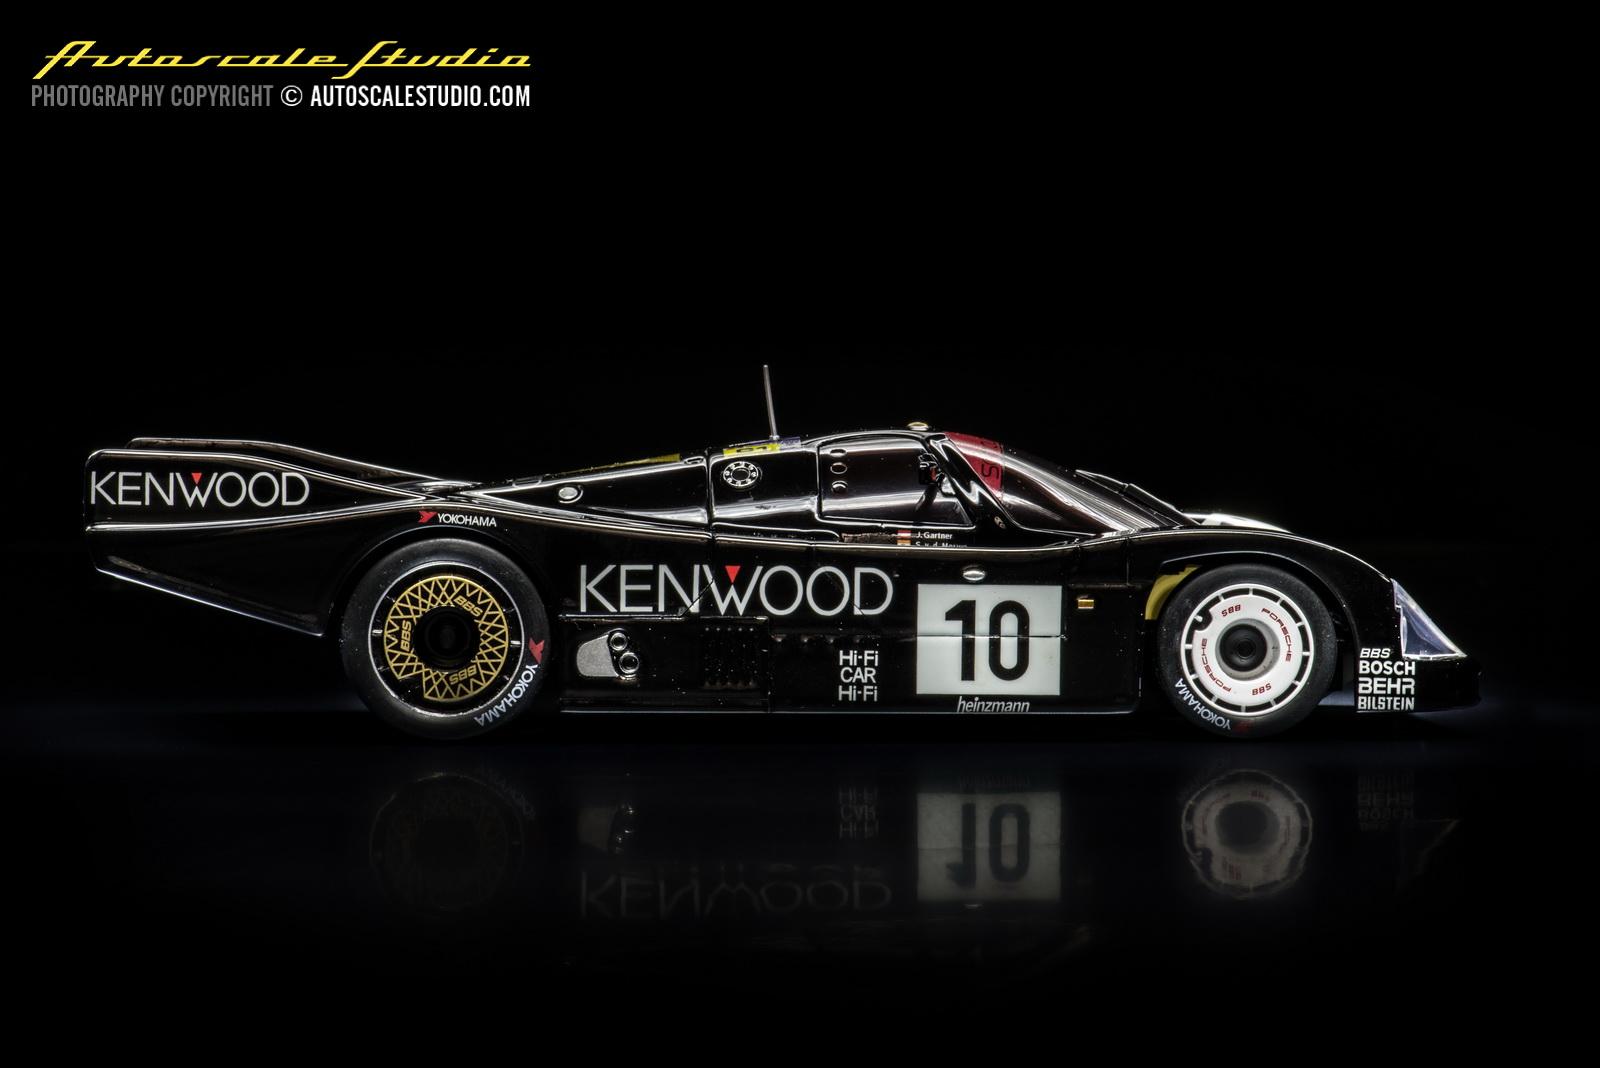 KYOSHO MZX322KR Auto Scale Porsche 962 C LH  MINI-Z MR-02 LM